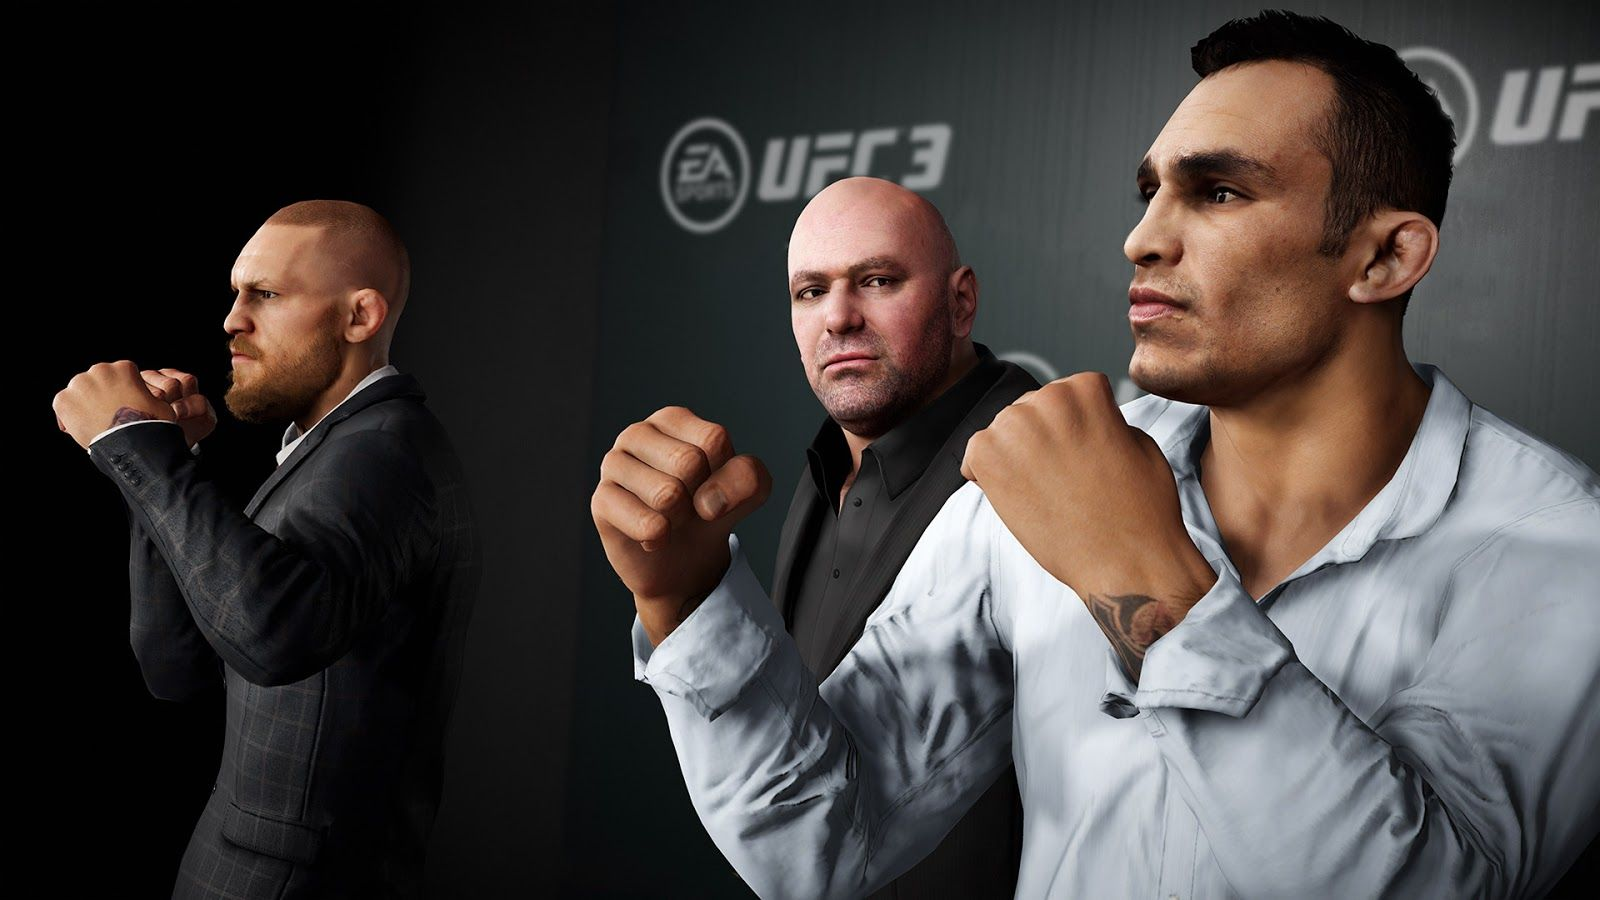 EA Sports UFC 3 Game Screenshot 8 in 2020 Ea sports ufc